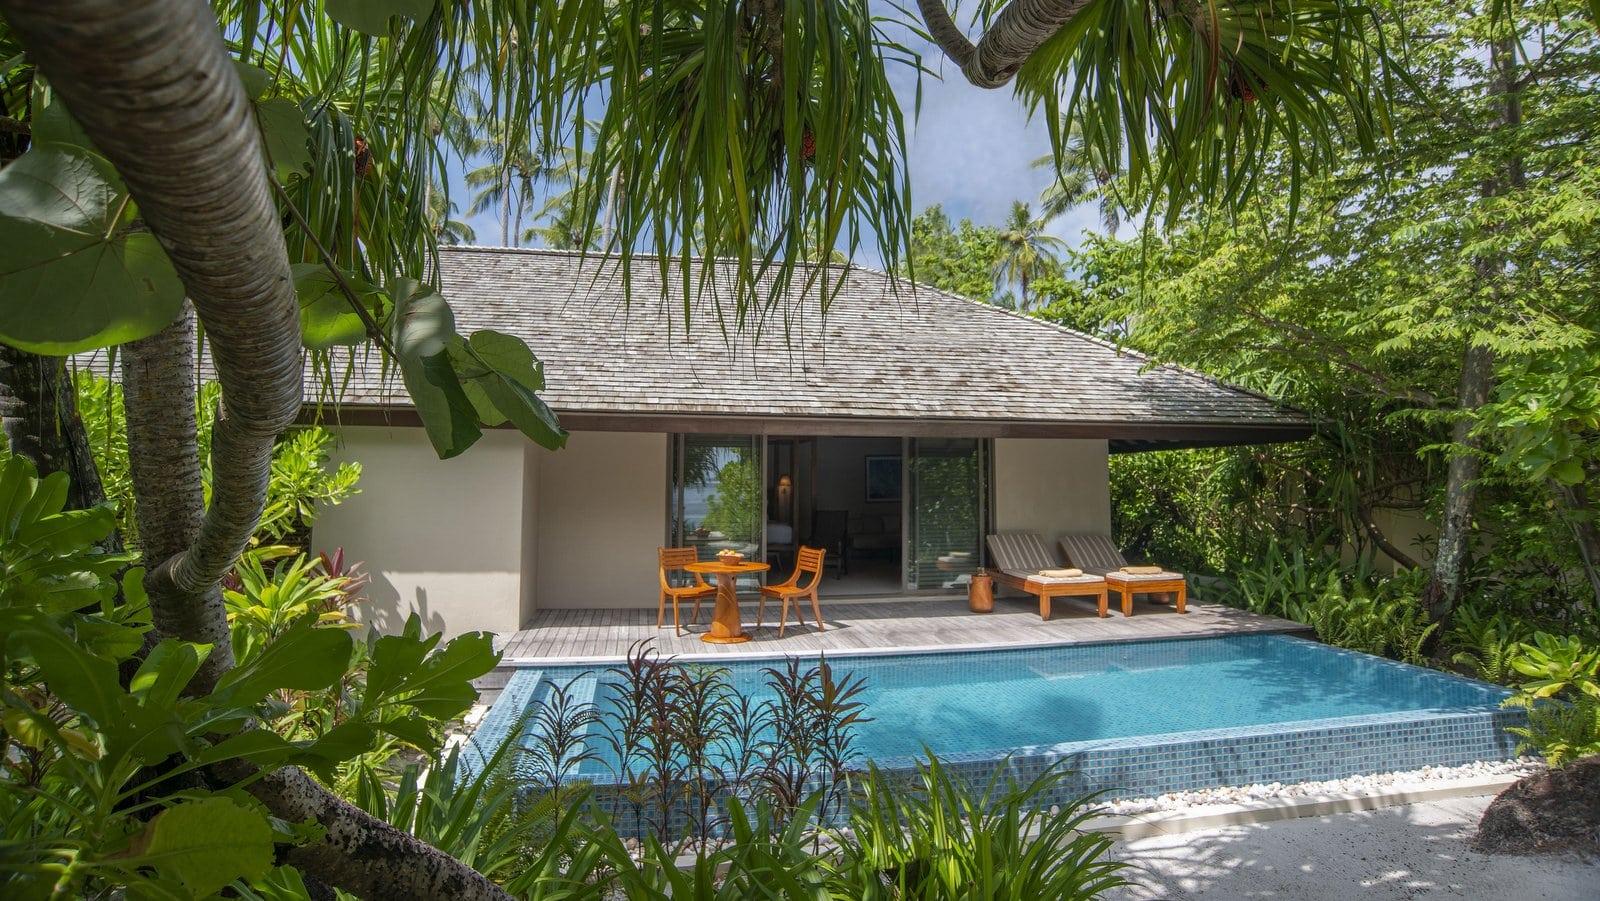 Мальдивы, отель The Residence Maldives at Dhigurah, номер Deluxe Beach Pool Villa